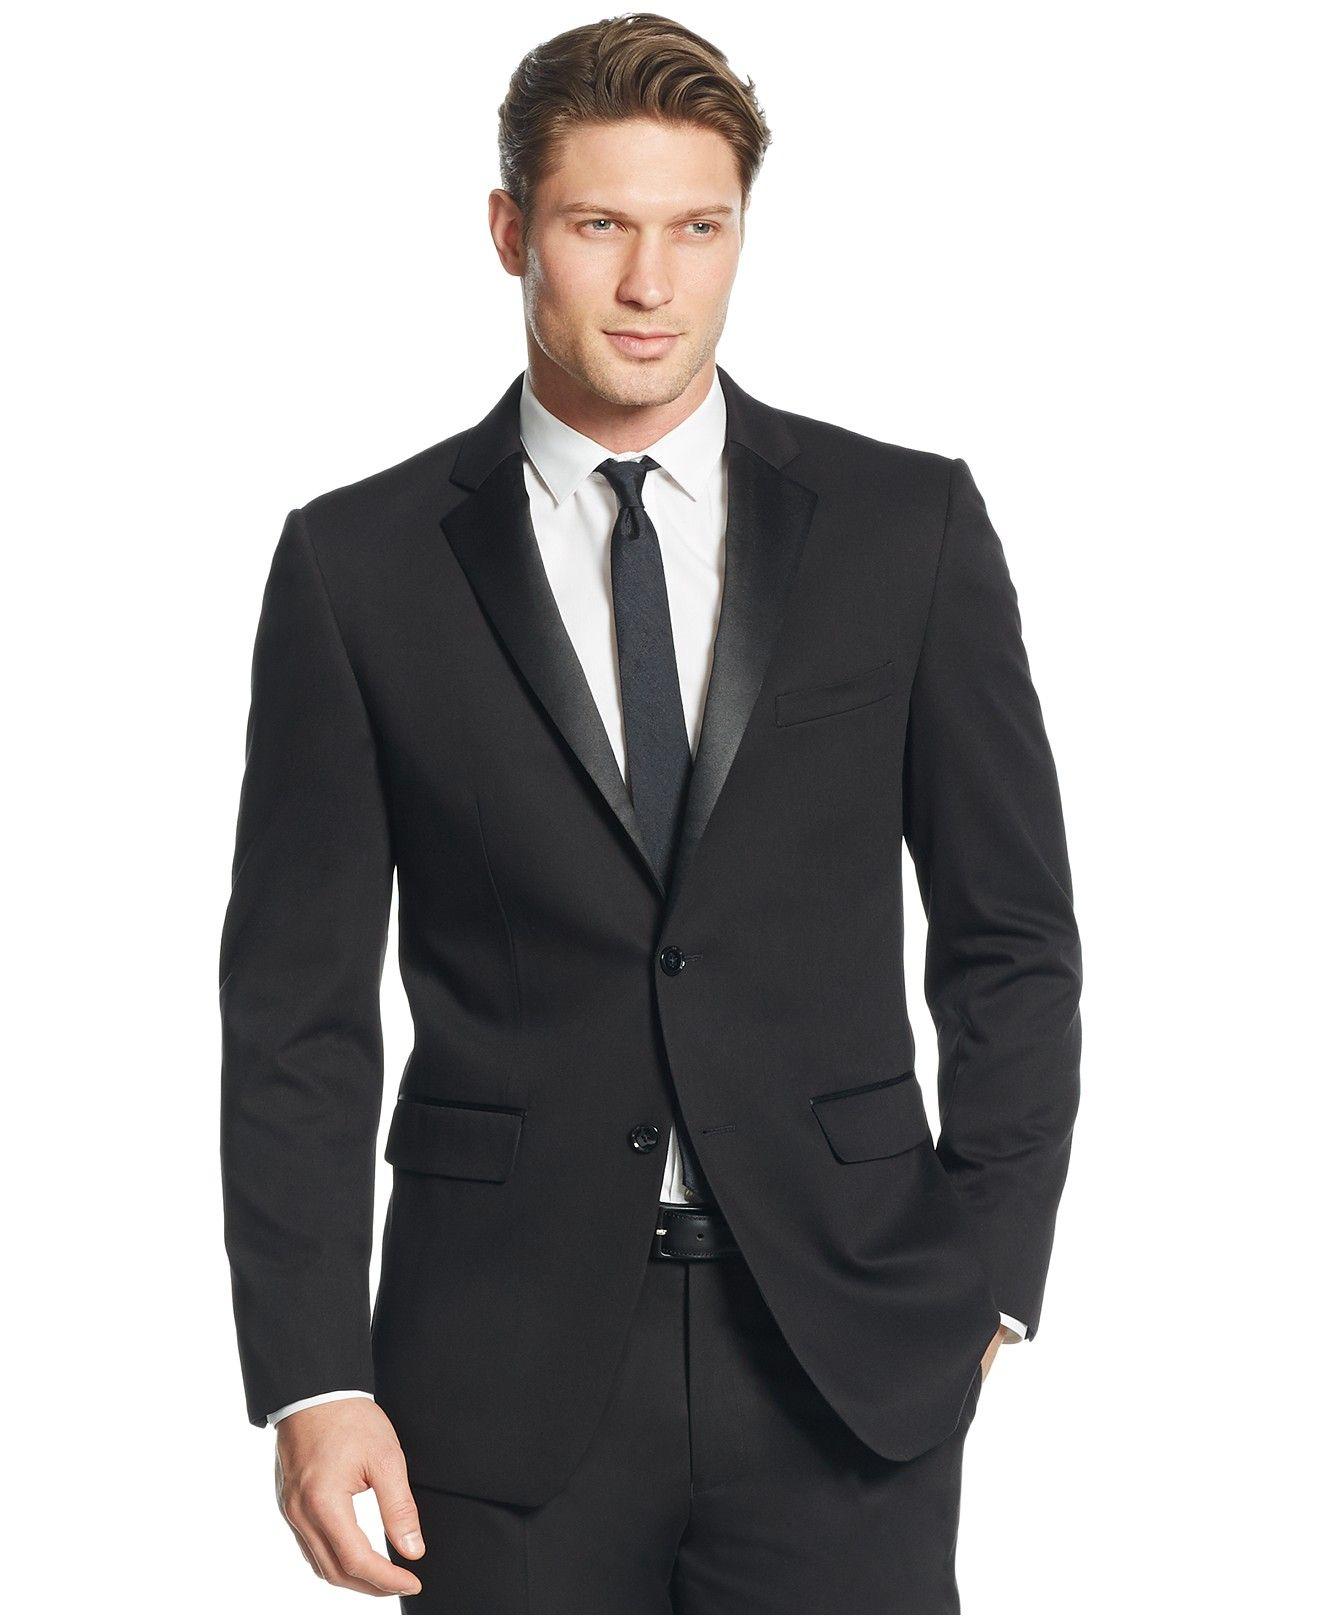 Perry Ellis Black Solid Slim-Fit Tuxedo - Suits  amp  Suit Separates - Men b3beda2de